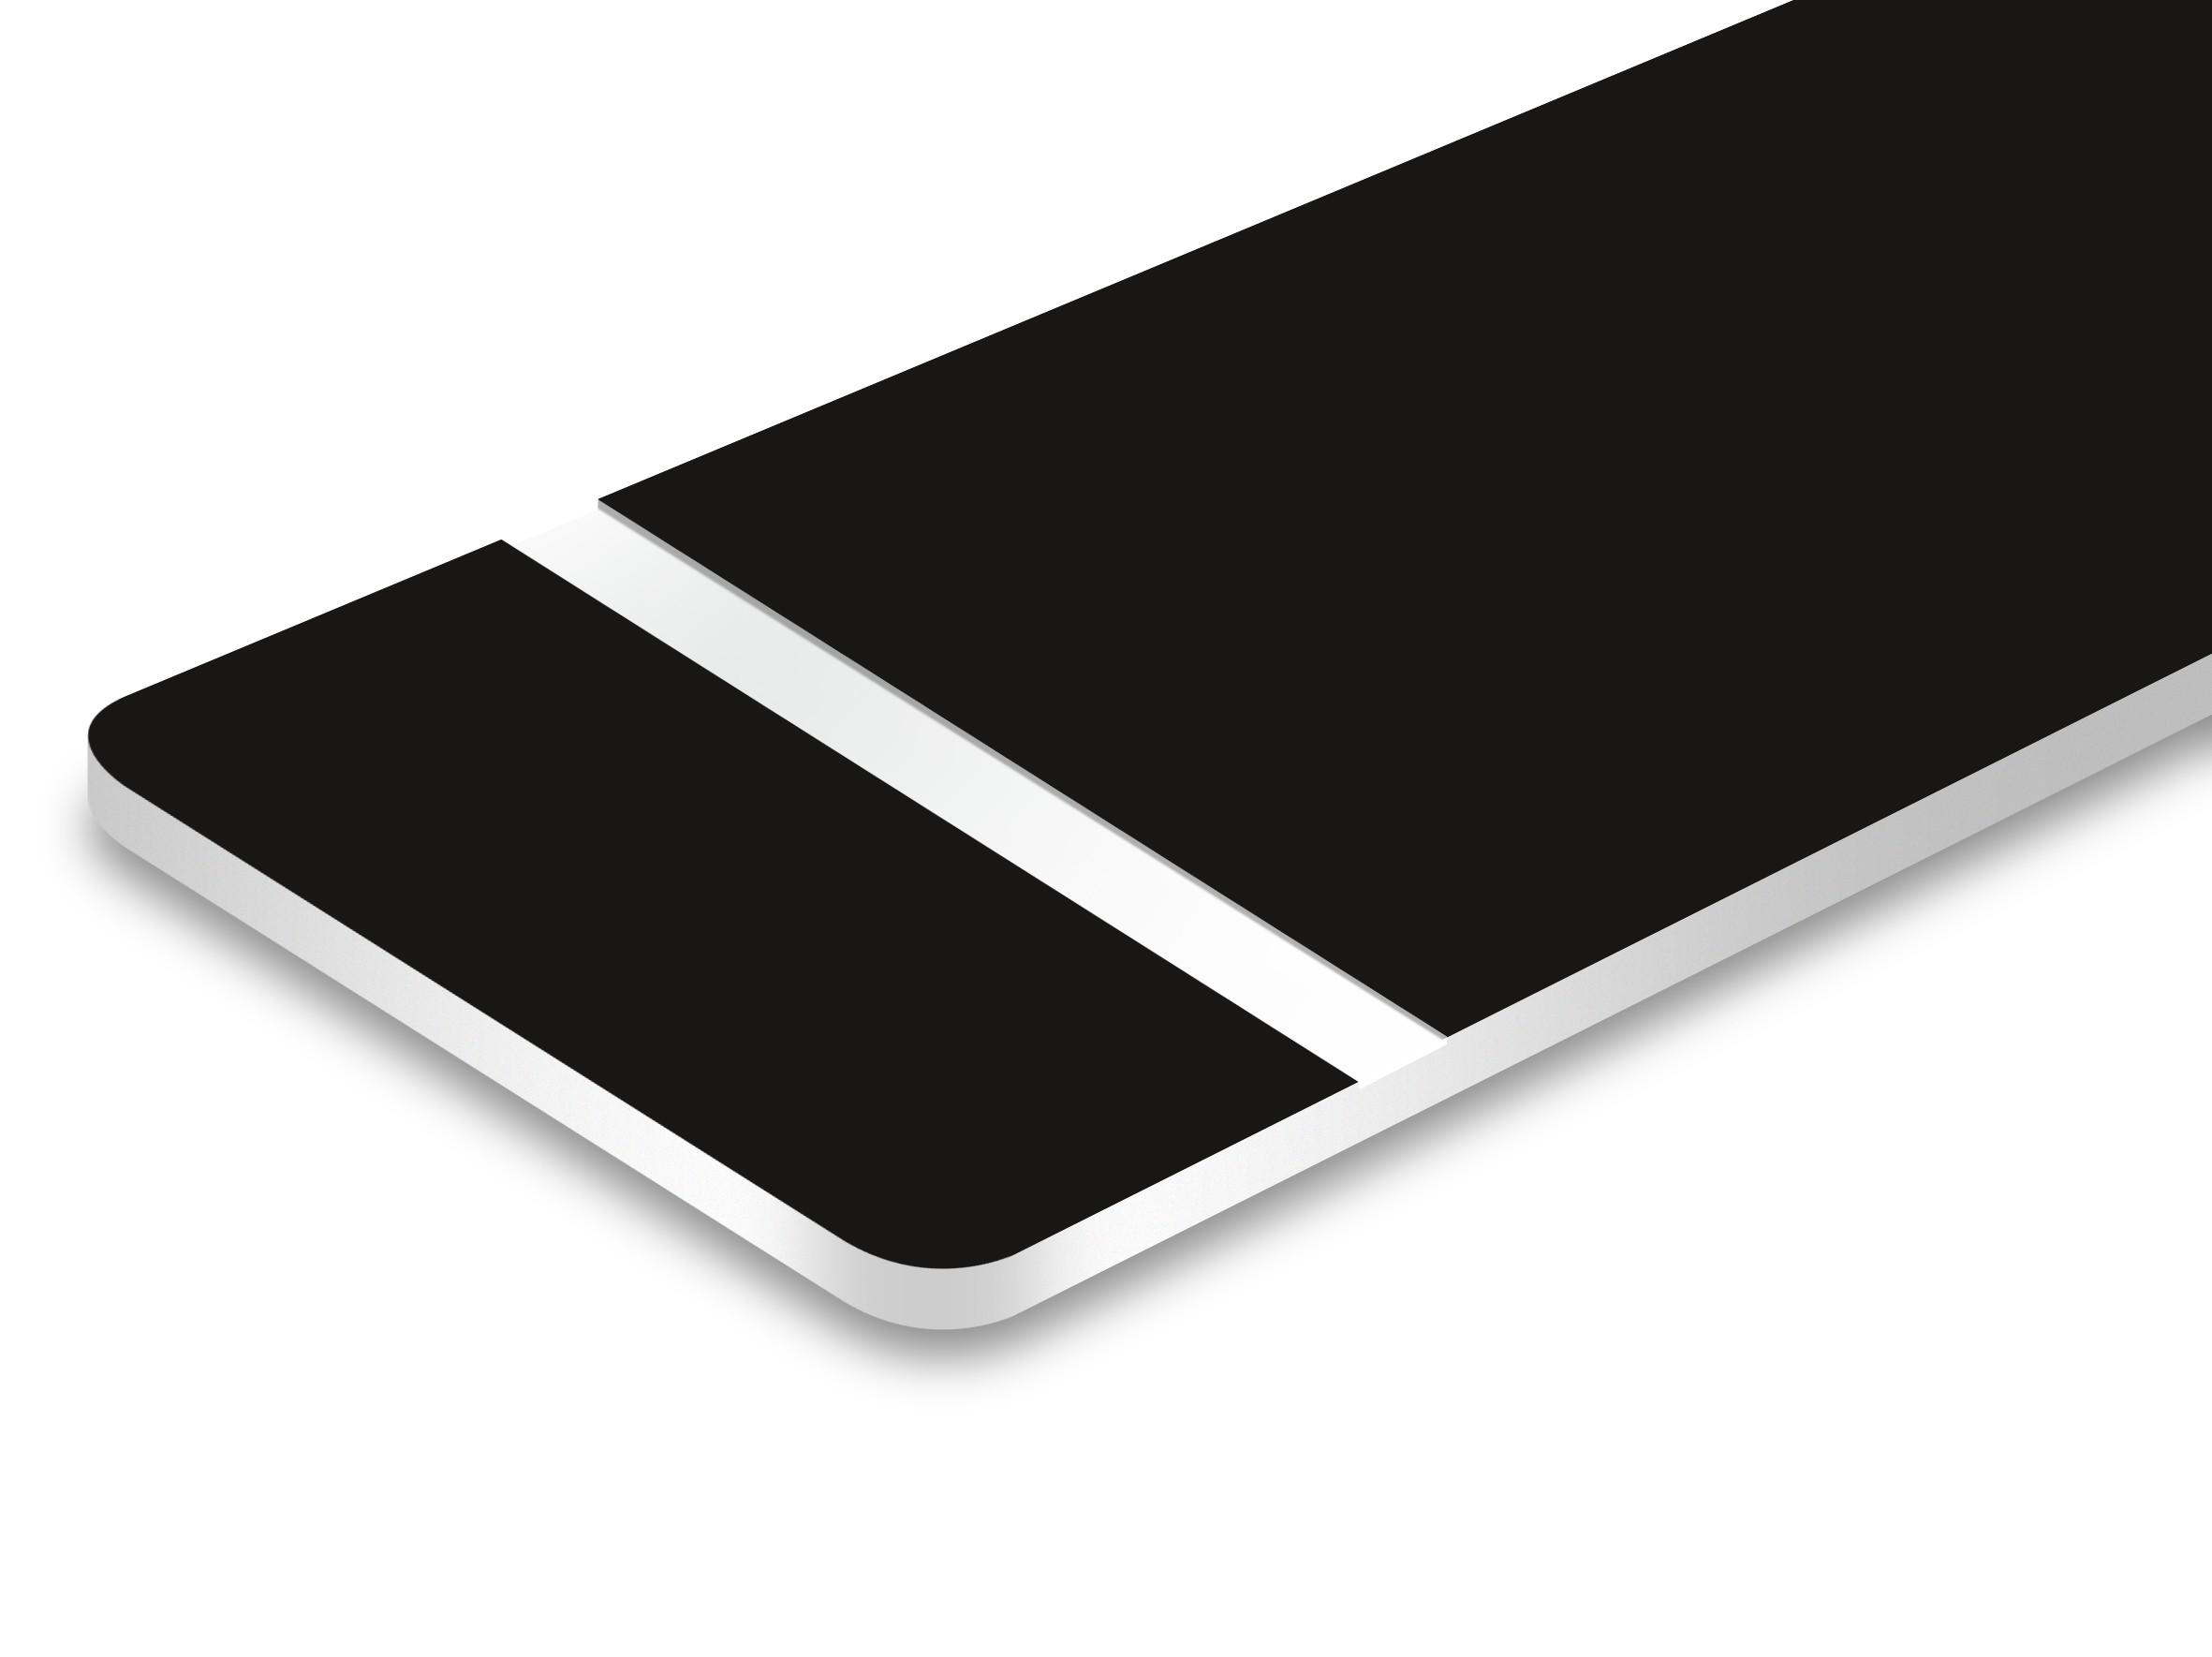 TroLase Ultra matt black/white 1.5 mm